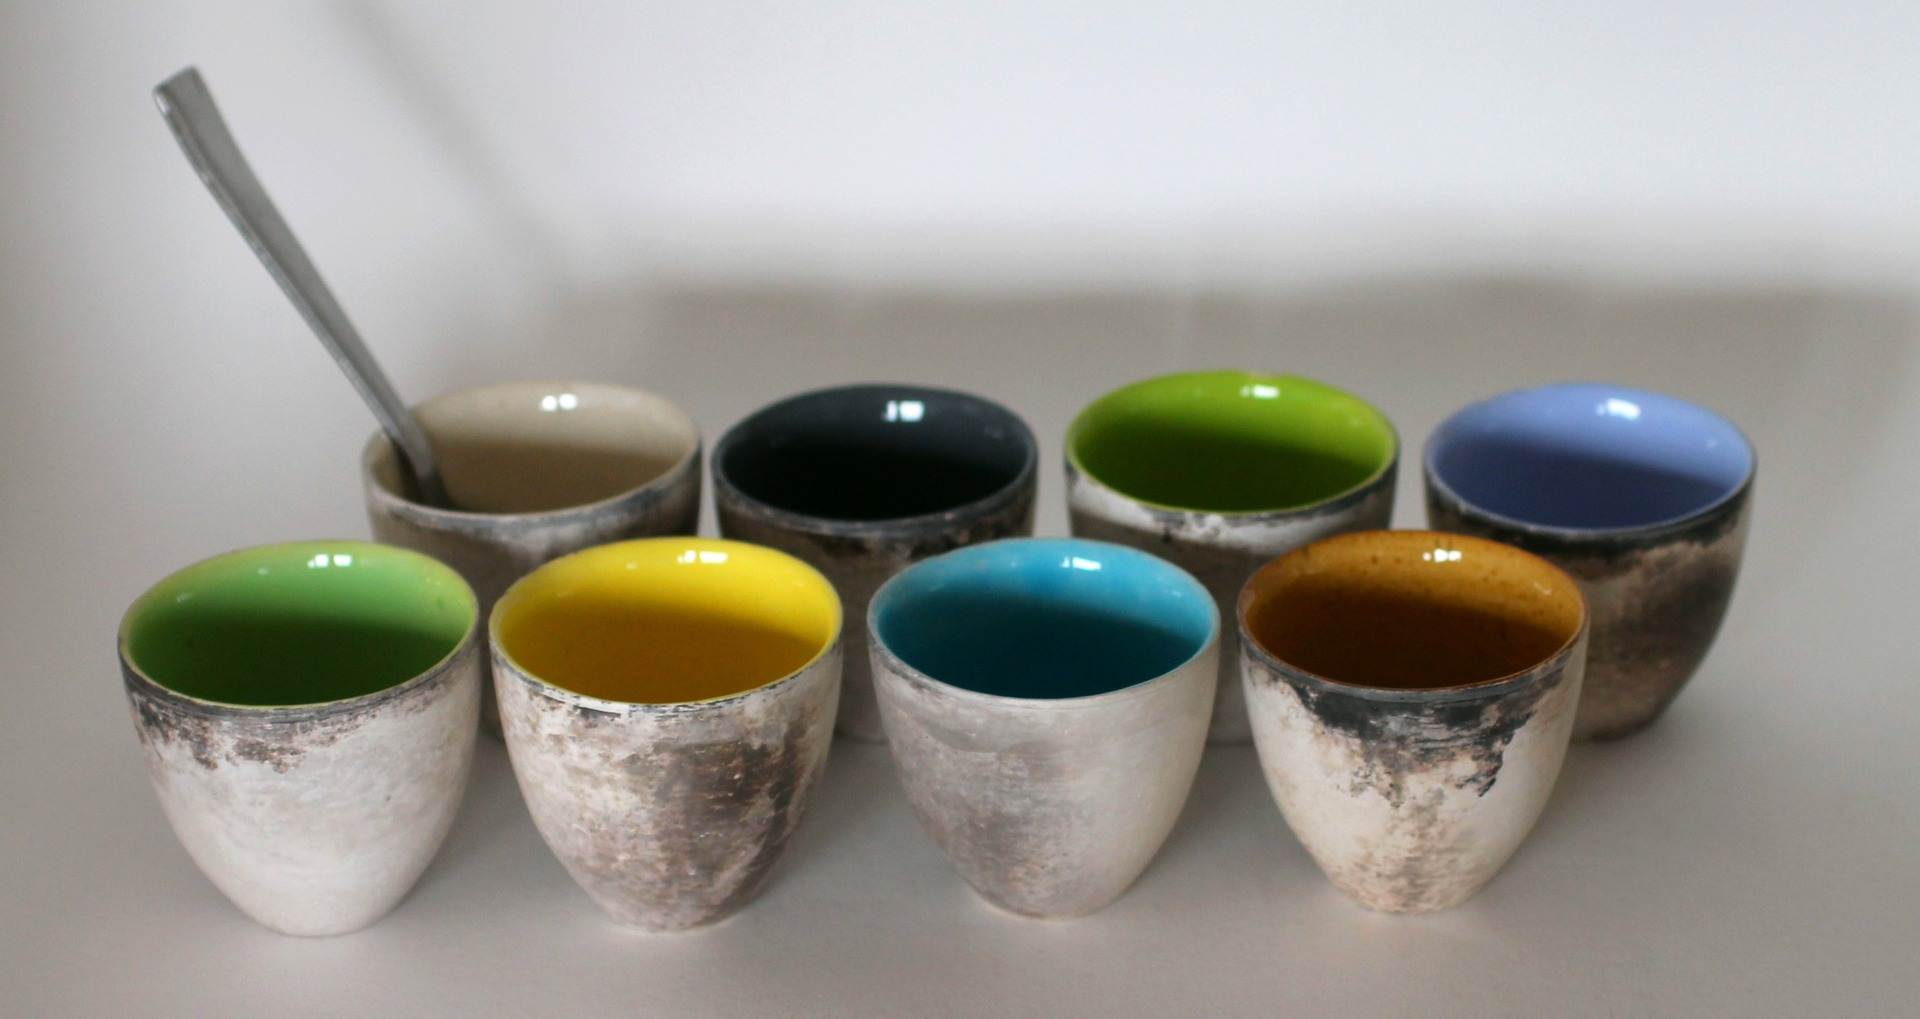 vaisselle ceramique artisanale les ustensiles de cuisine. Black Bedroom Furniture Sets. Home Design Ideas